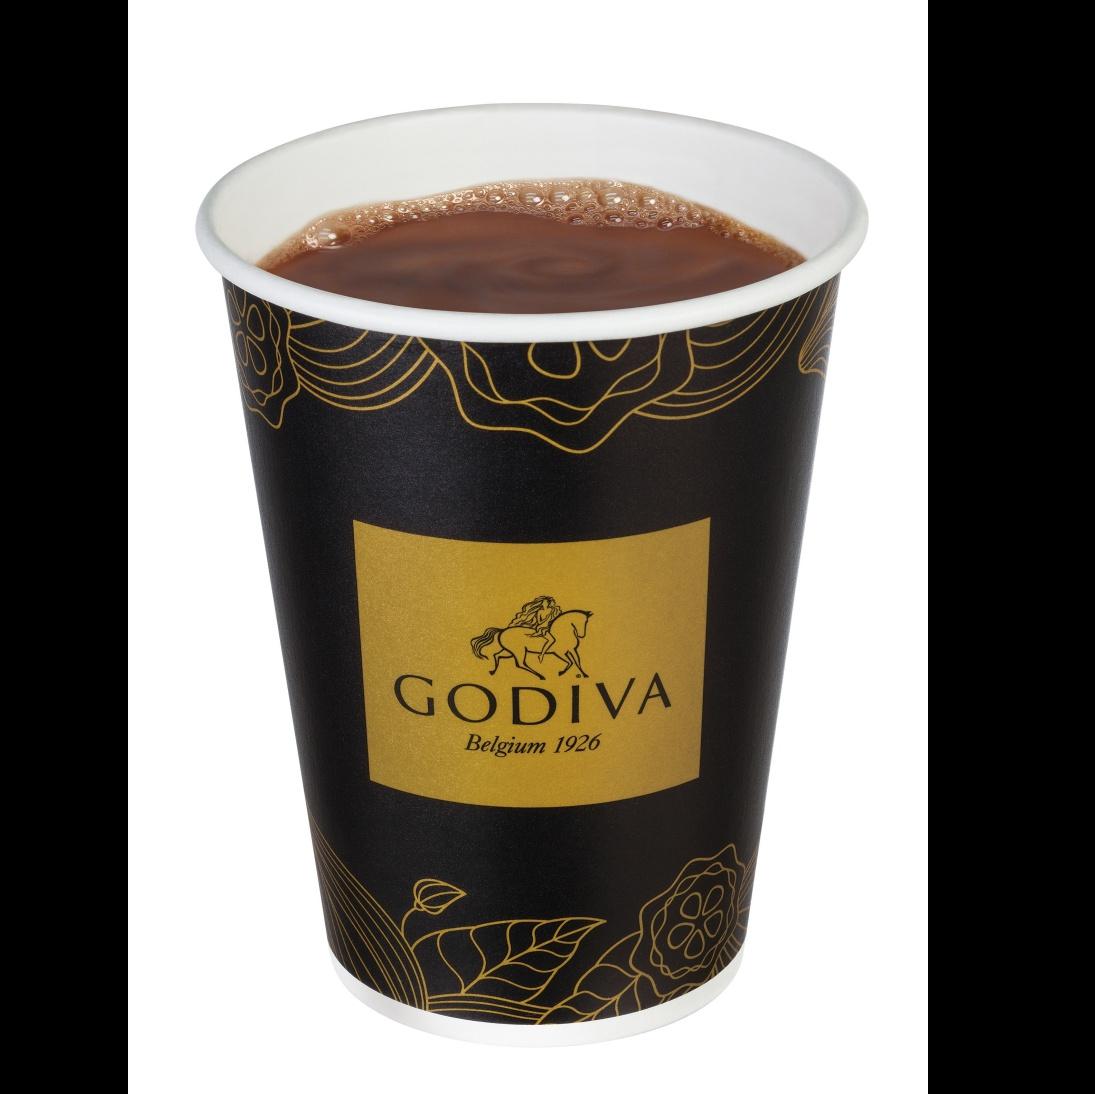 <p>全台限量 65 萬杯!GODIVA X 7-ELEVEN 醇黑熱巧克力即將暖心上市</p>